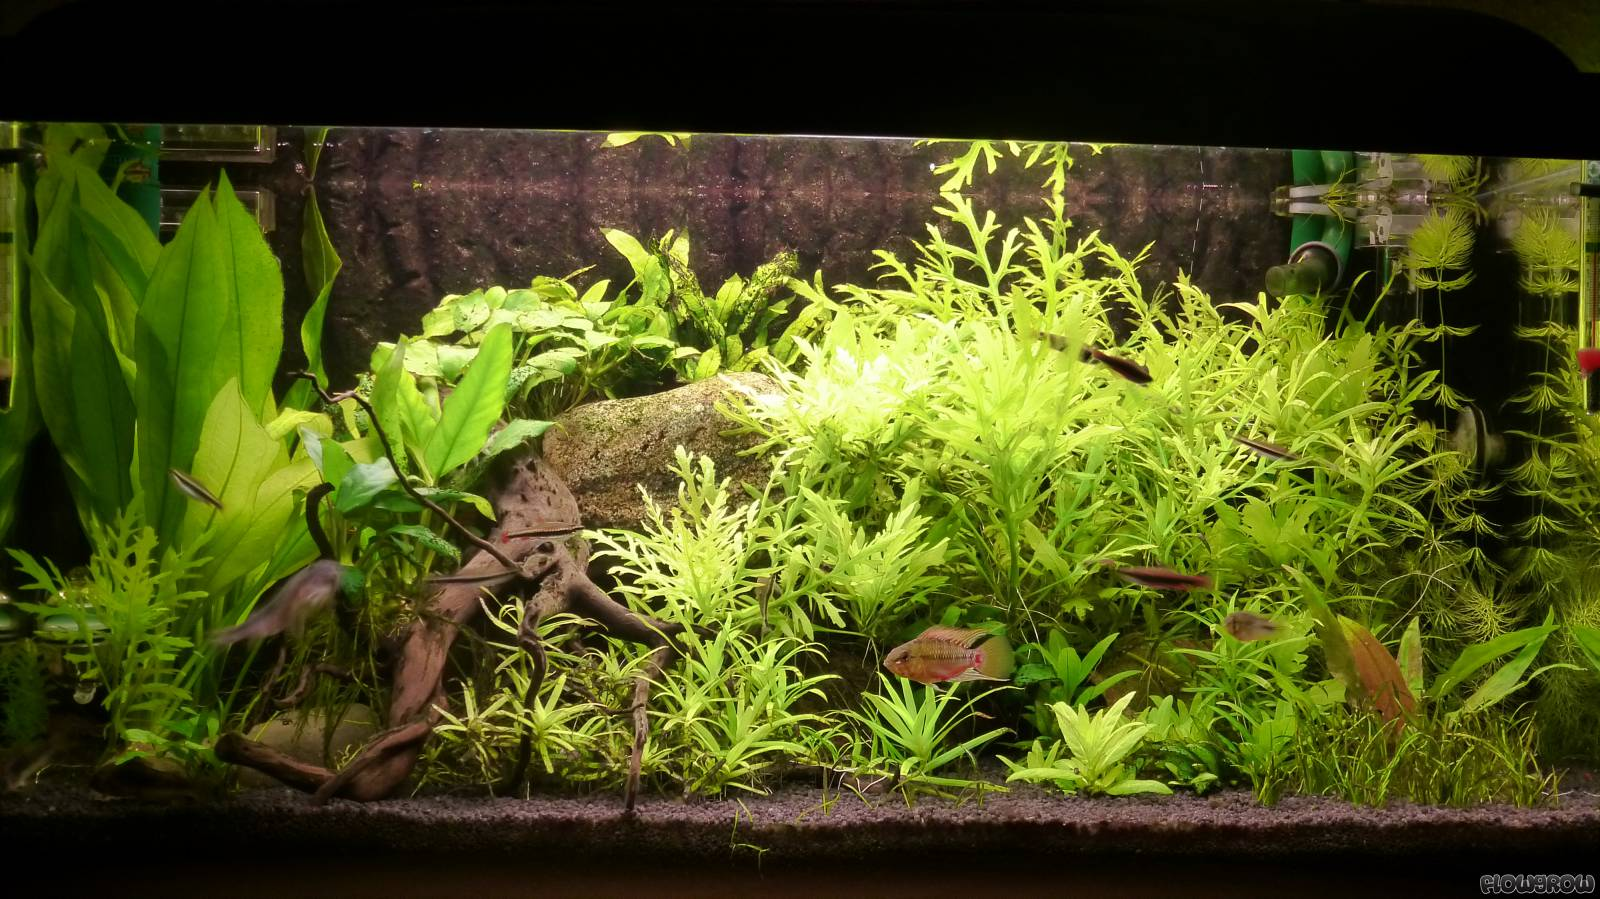 Mein kleines Aquarium - Flowgrow Aquascape/Aquarien-Datenbank